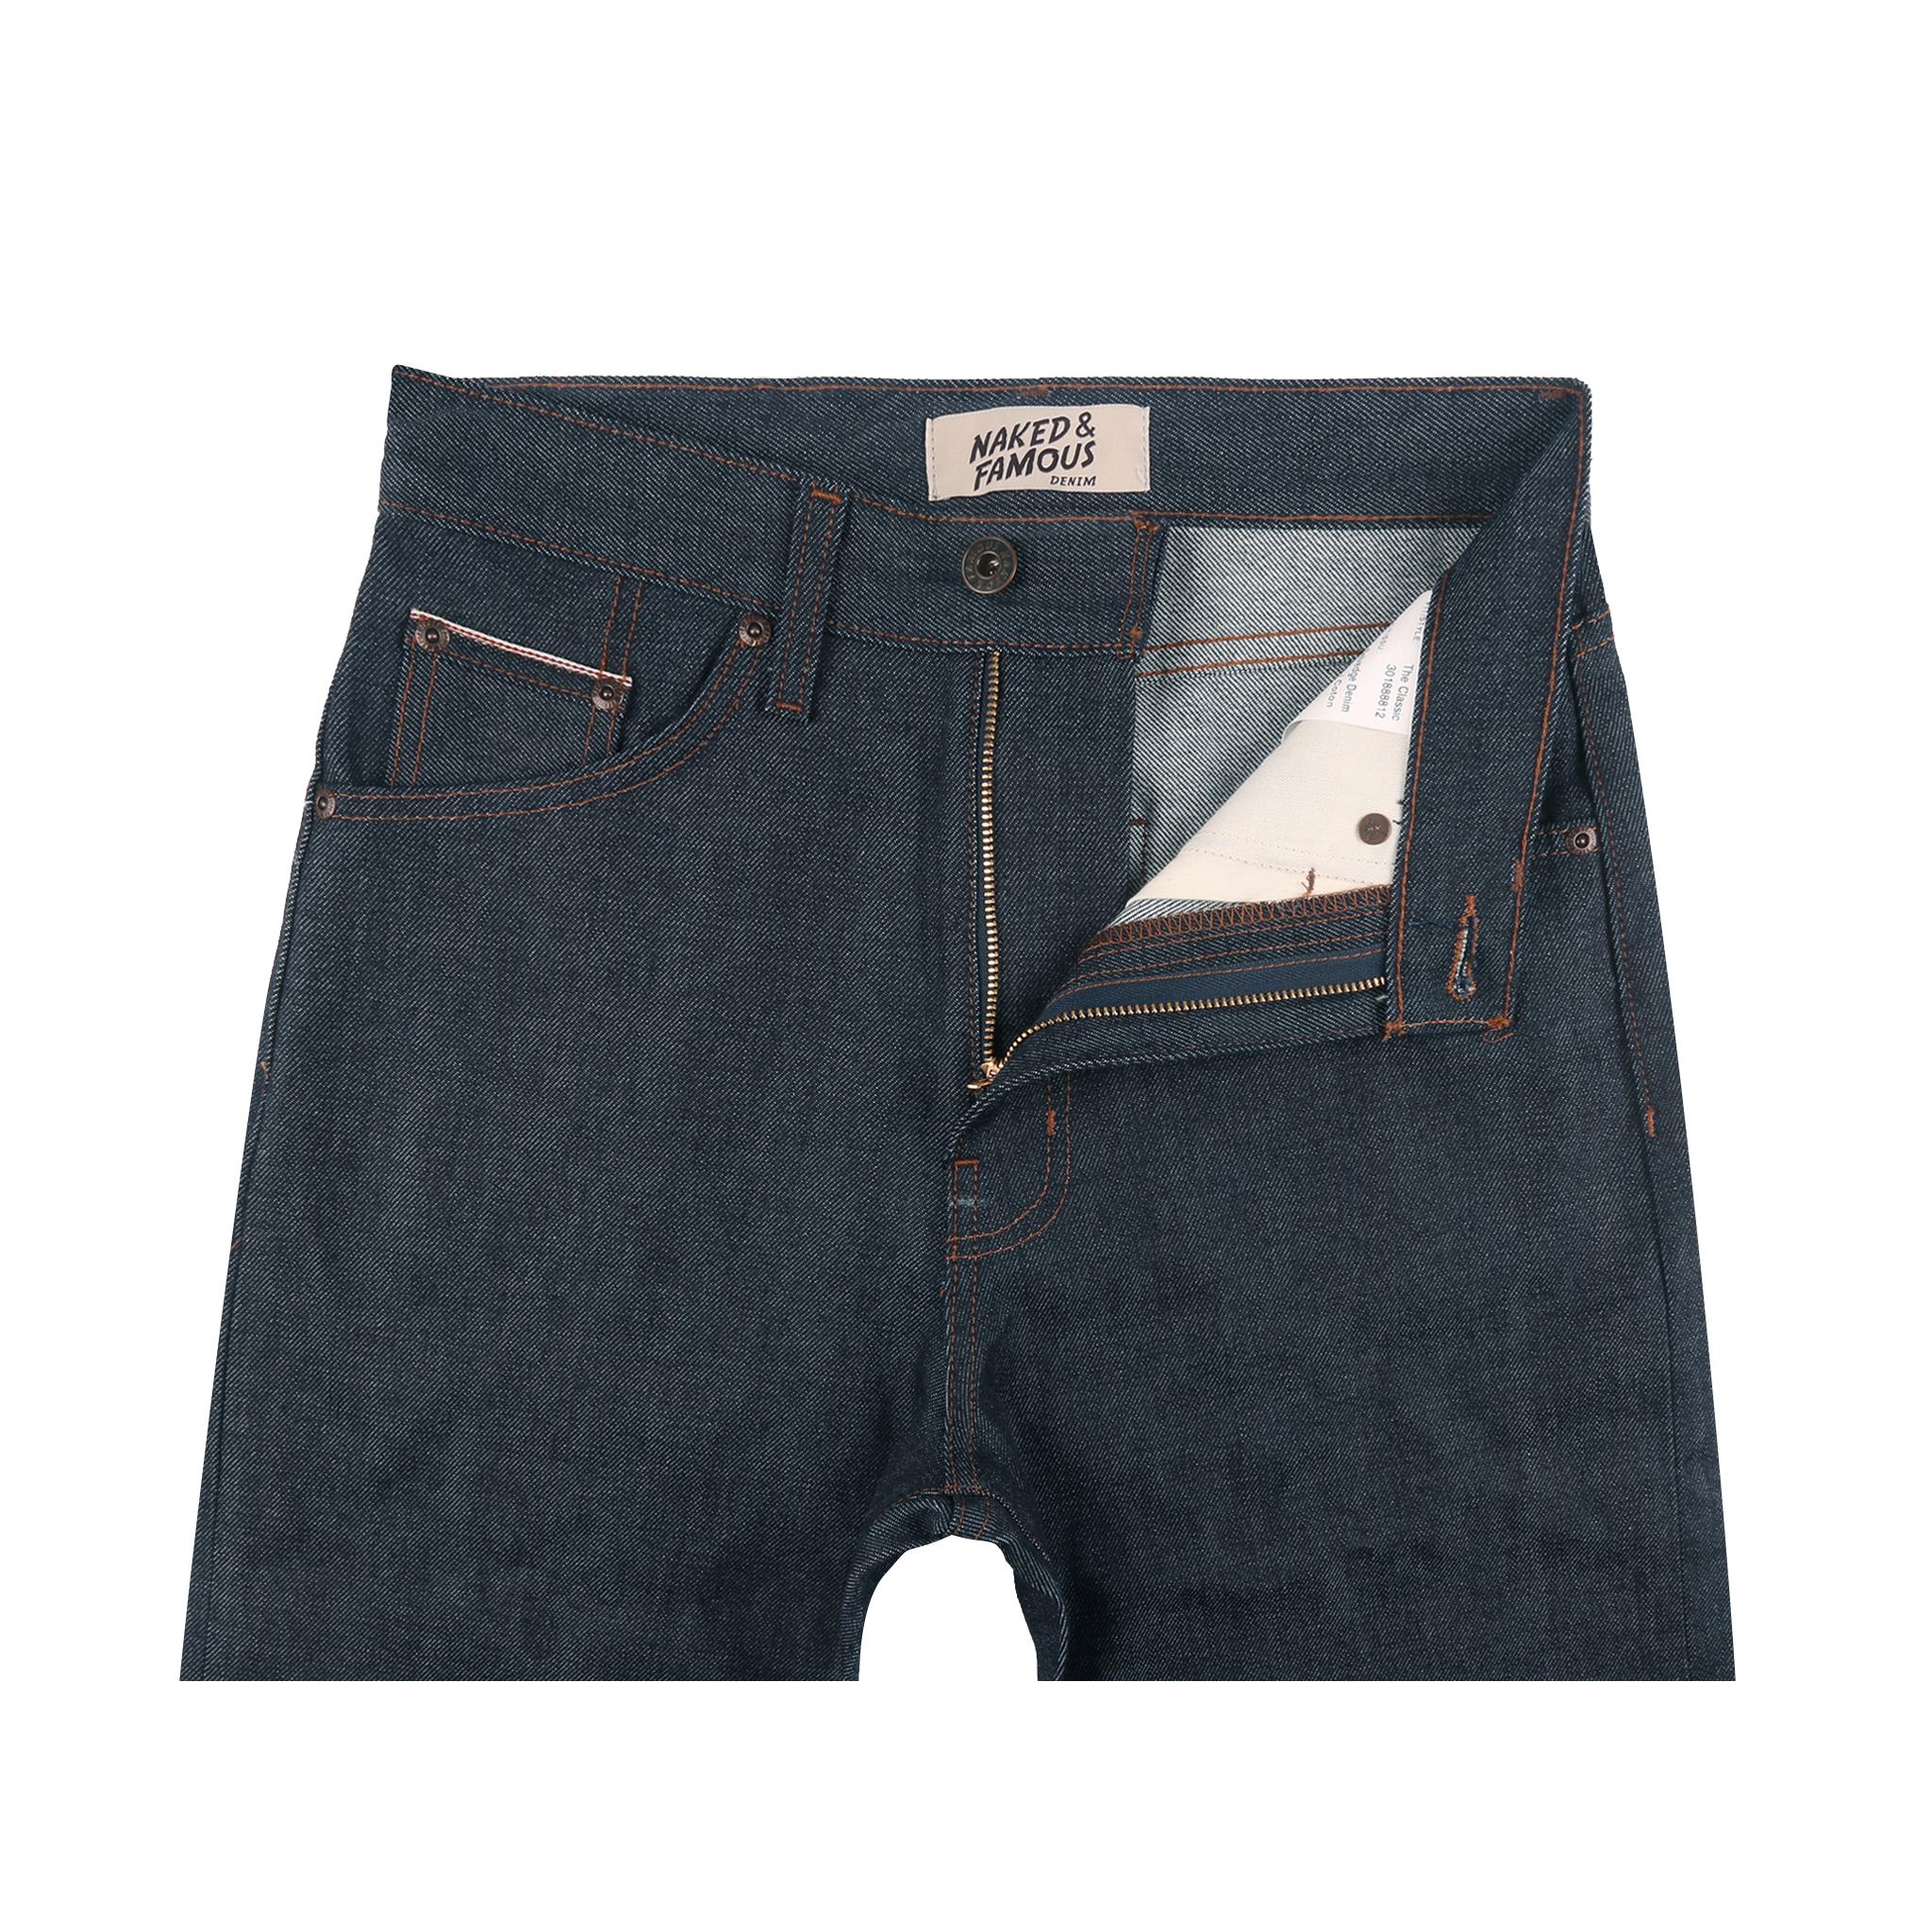 Women's 11oz Indigo Selvedge jeans front view